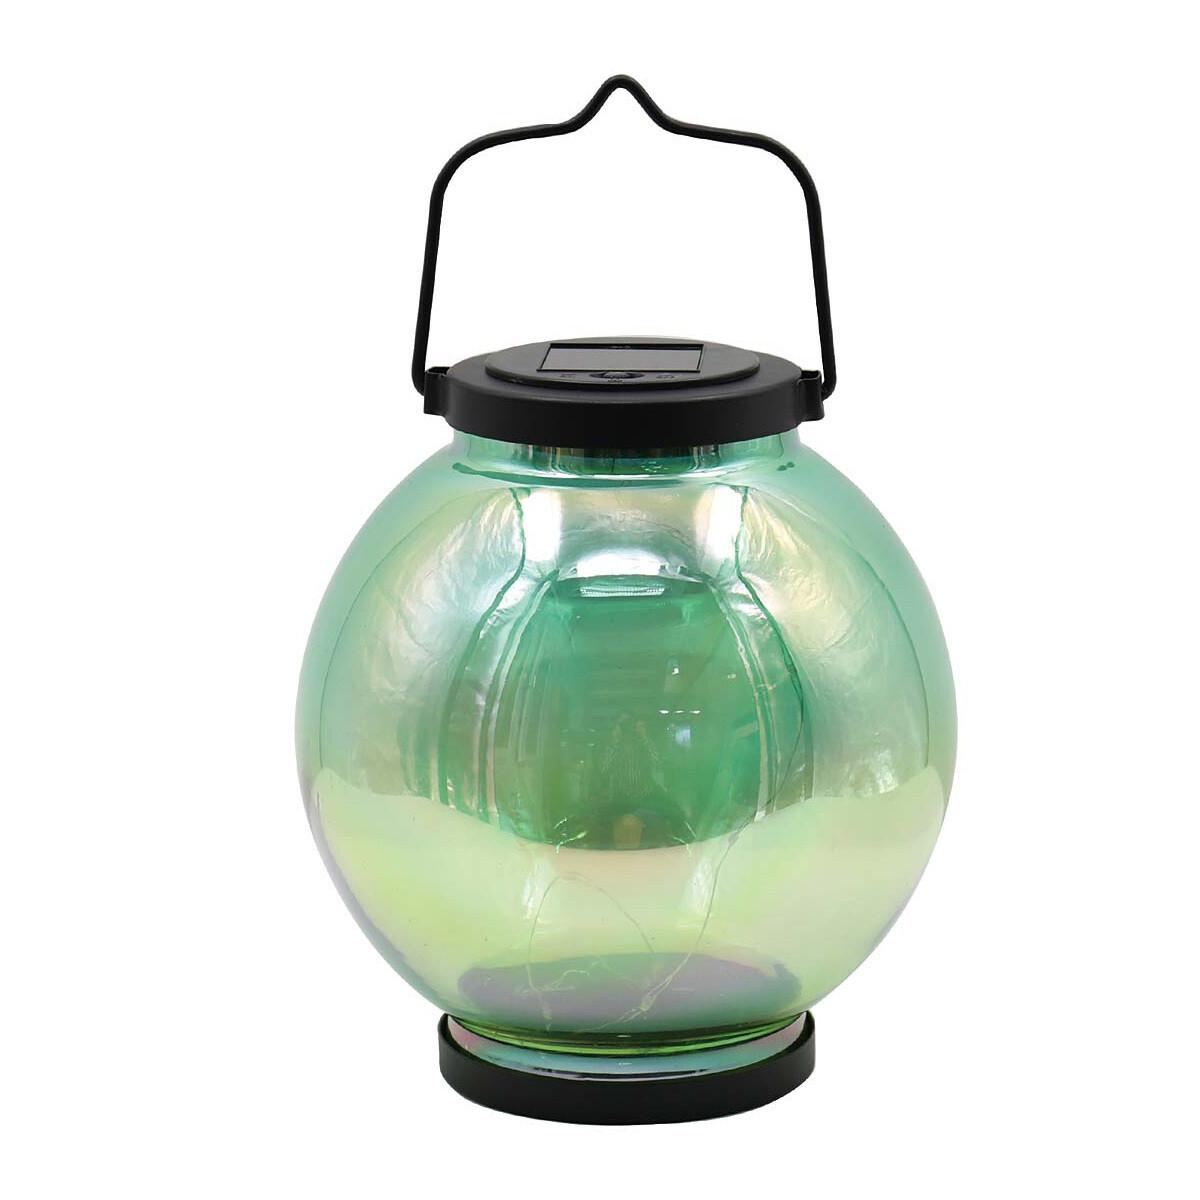 Iridescent Ombre Lantern, Round GREEN